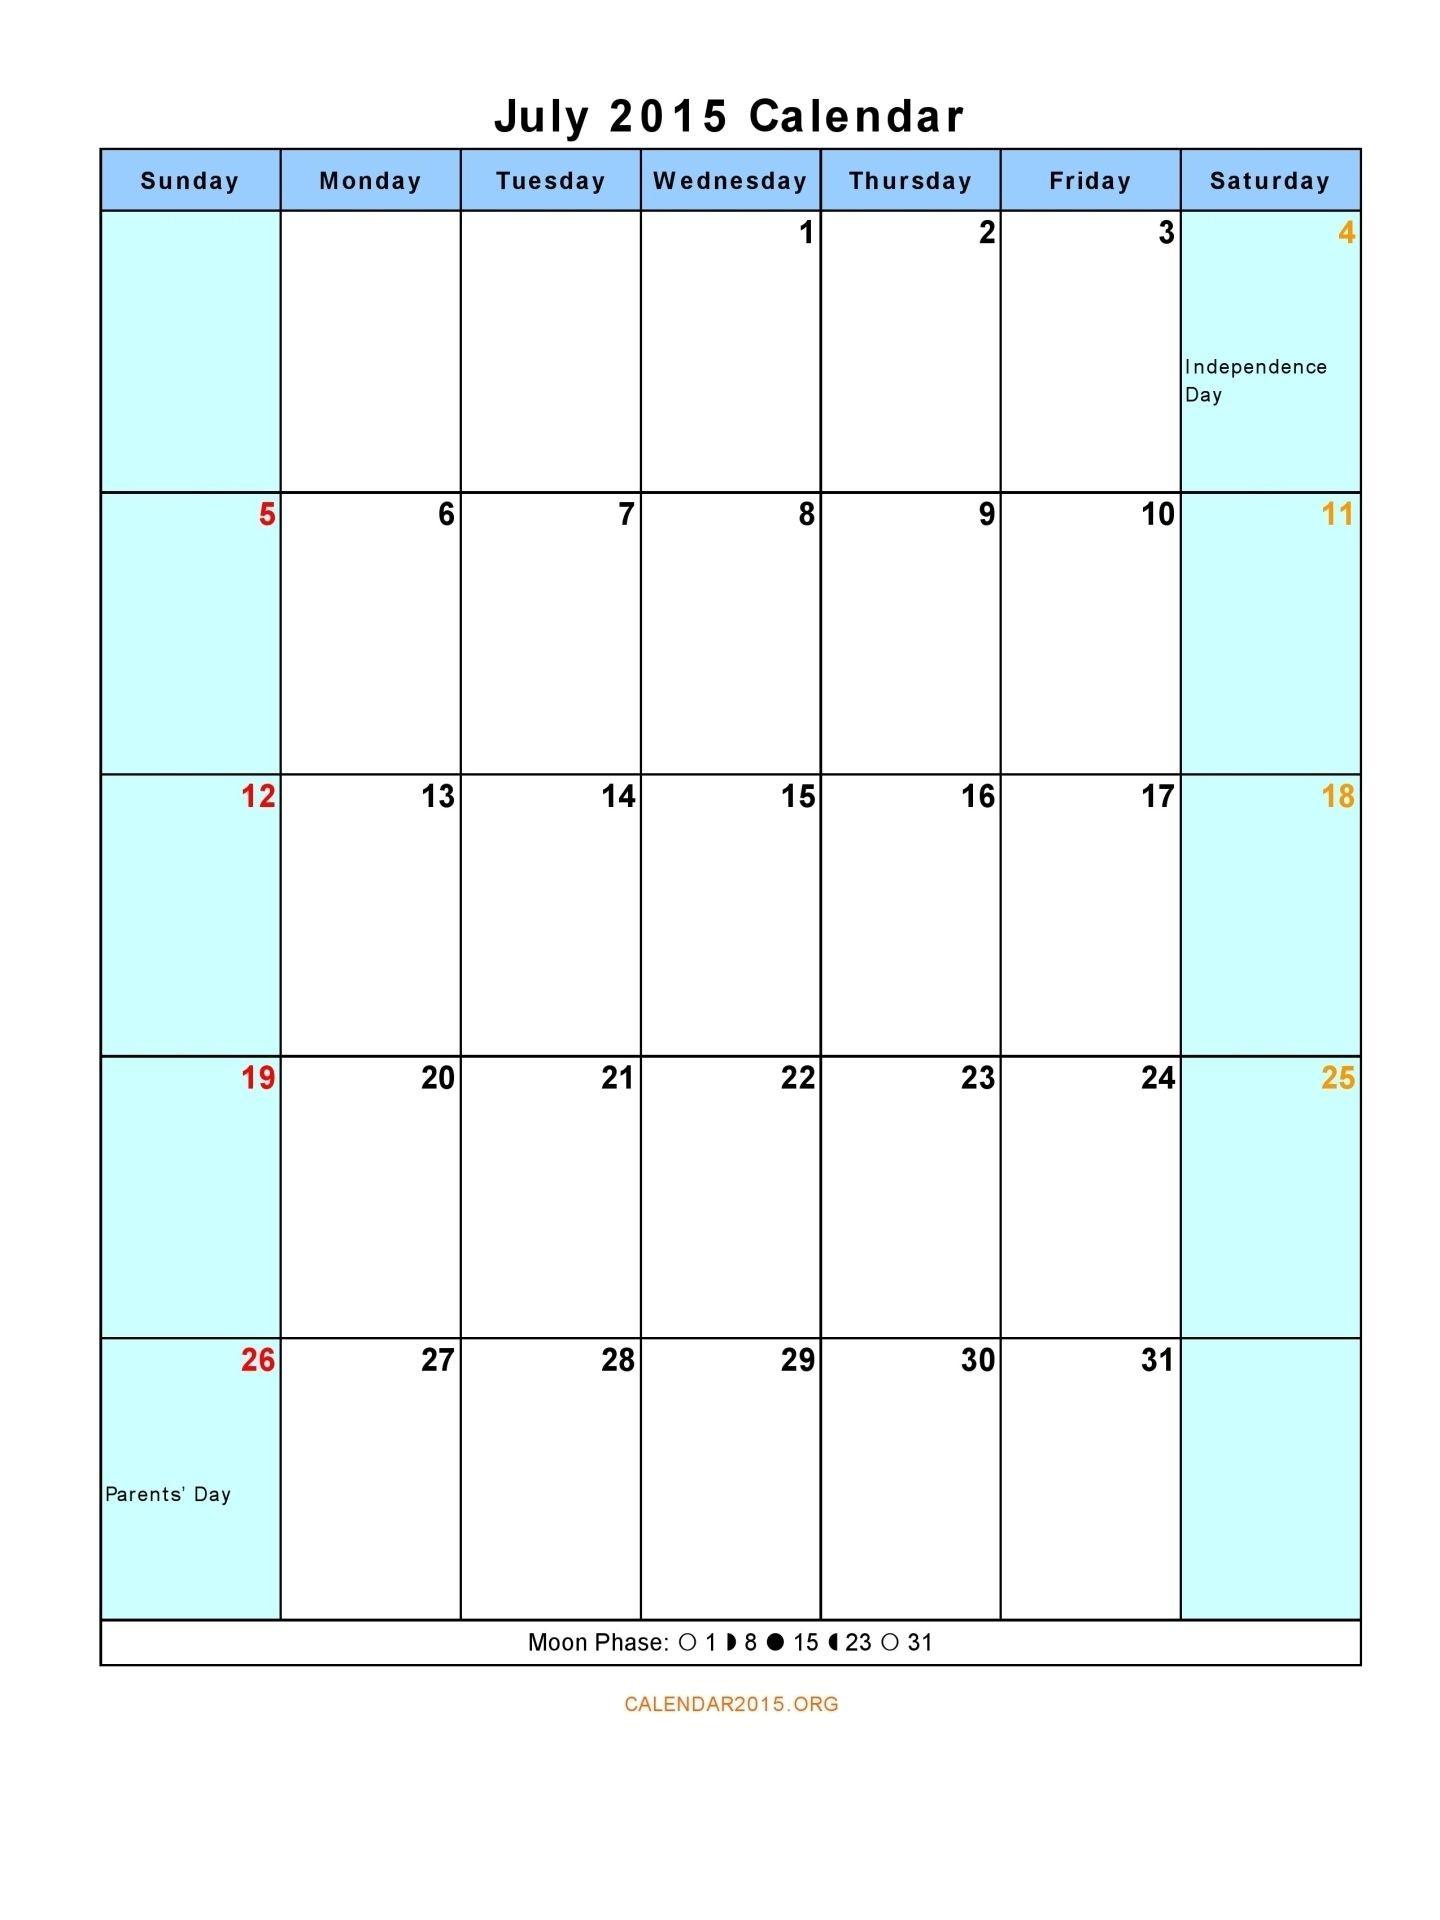 July 2015 Calendar Printable 12